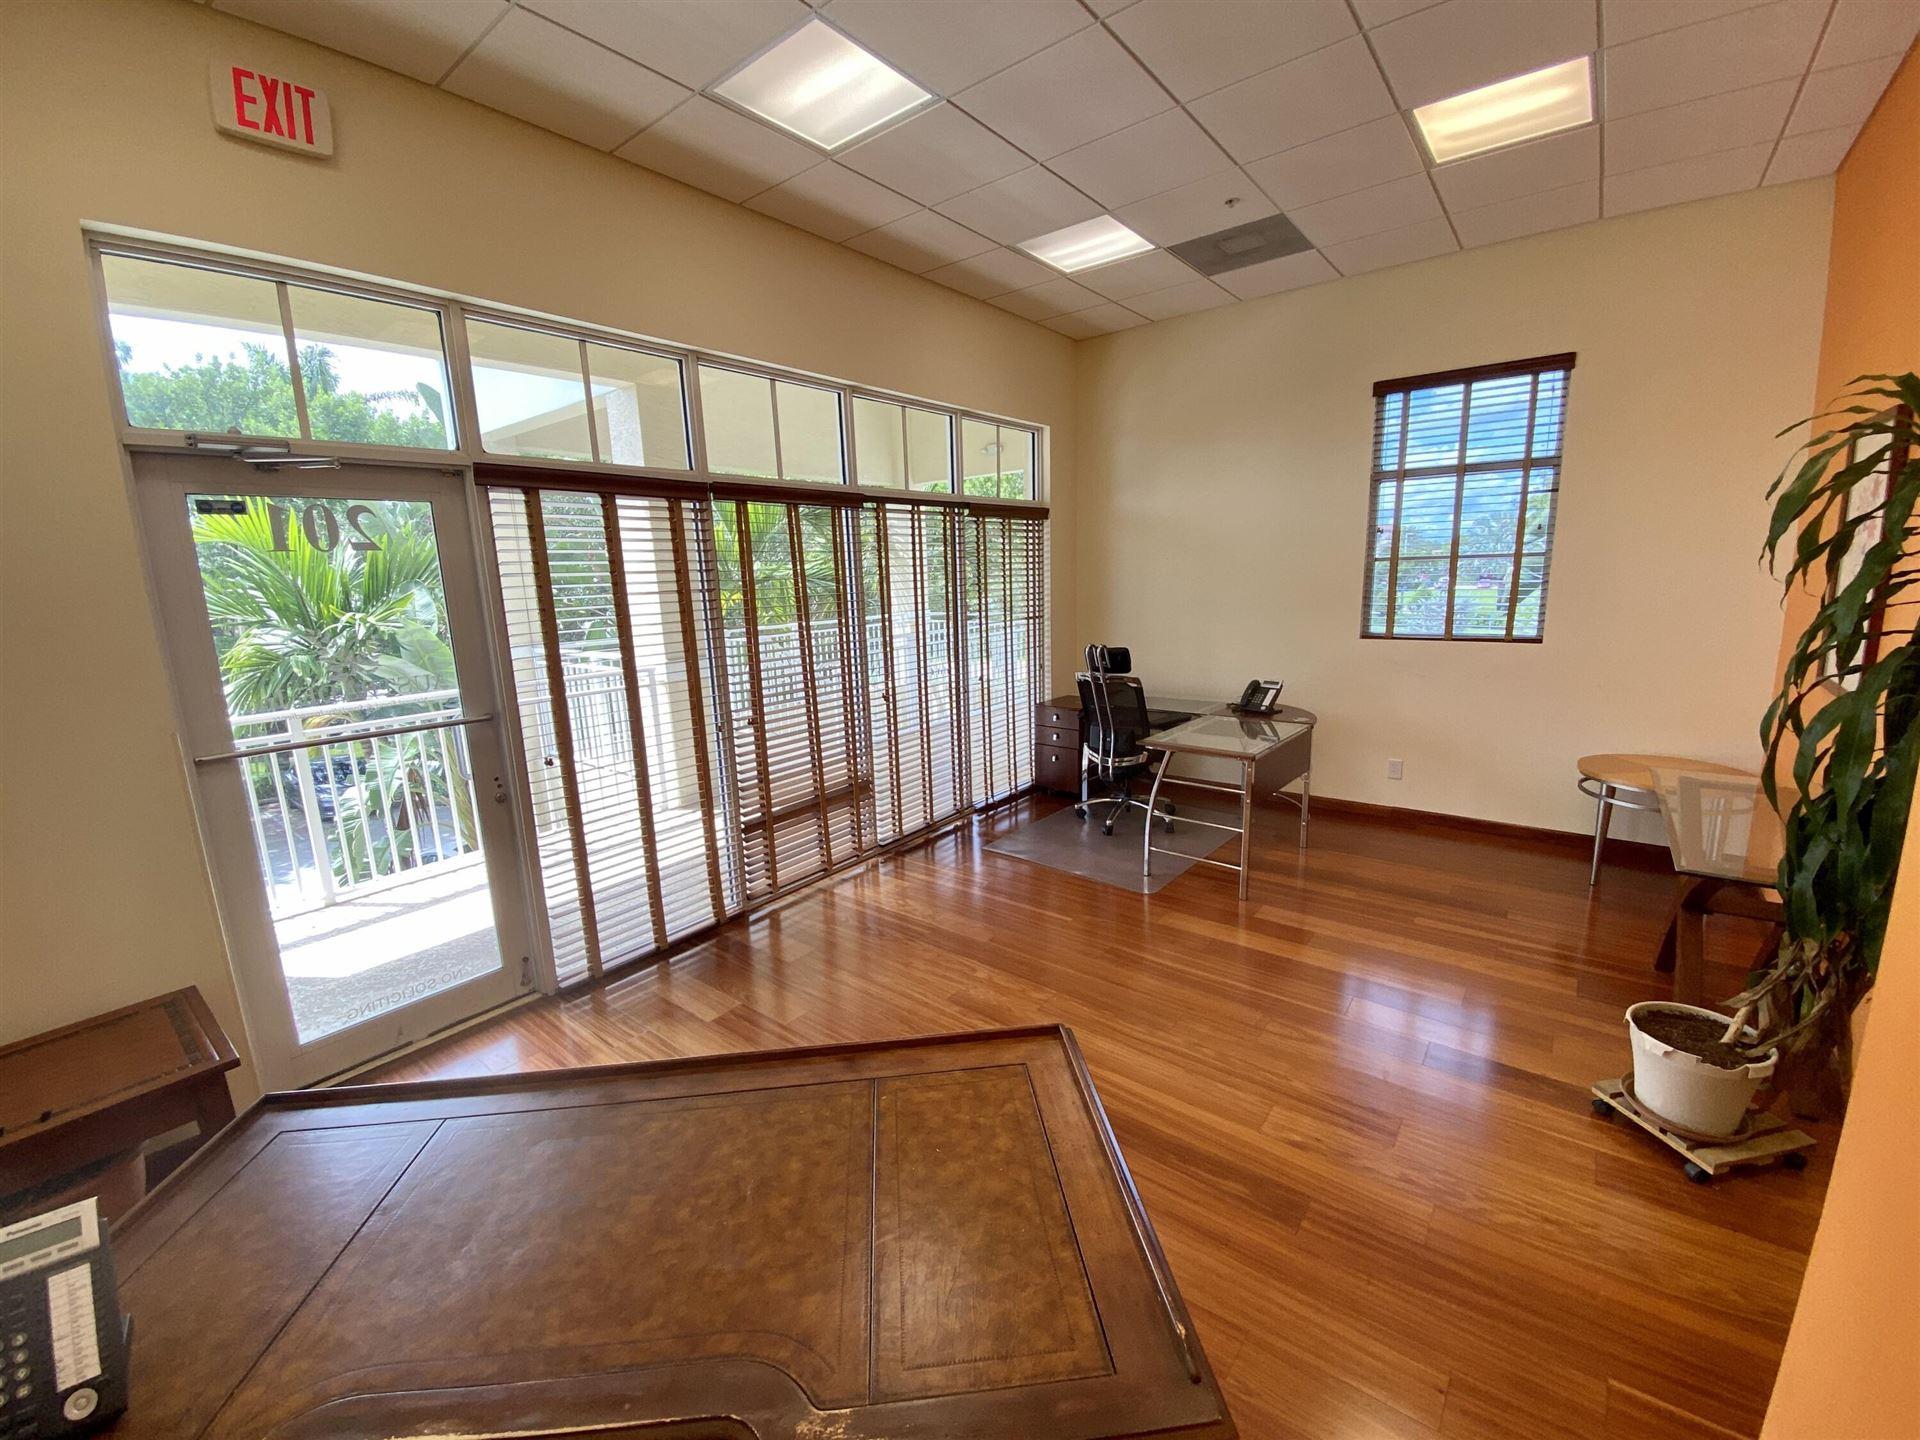 Photo of 3309 Northlake 201 Boulevard #201, Palm Beach Gardens, FL 33403 (MLS # RX-10746706)